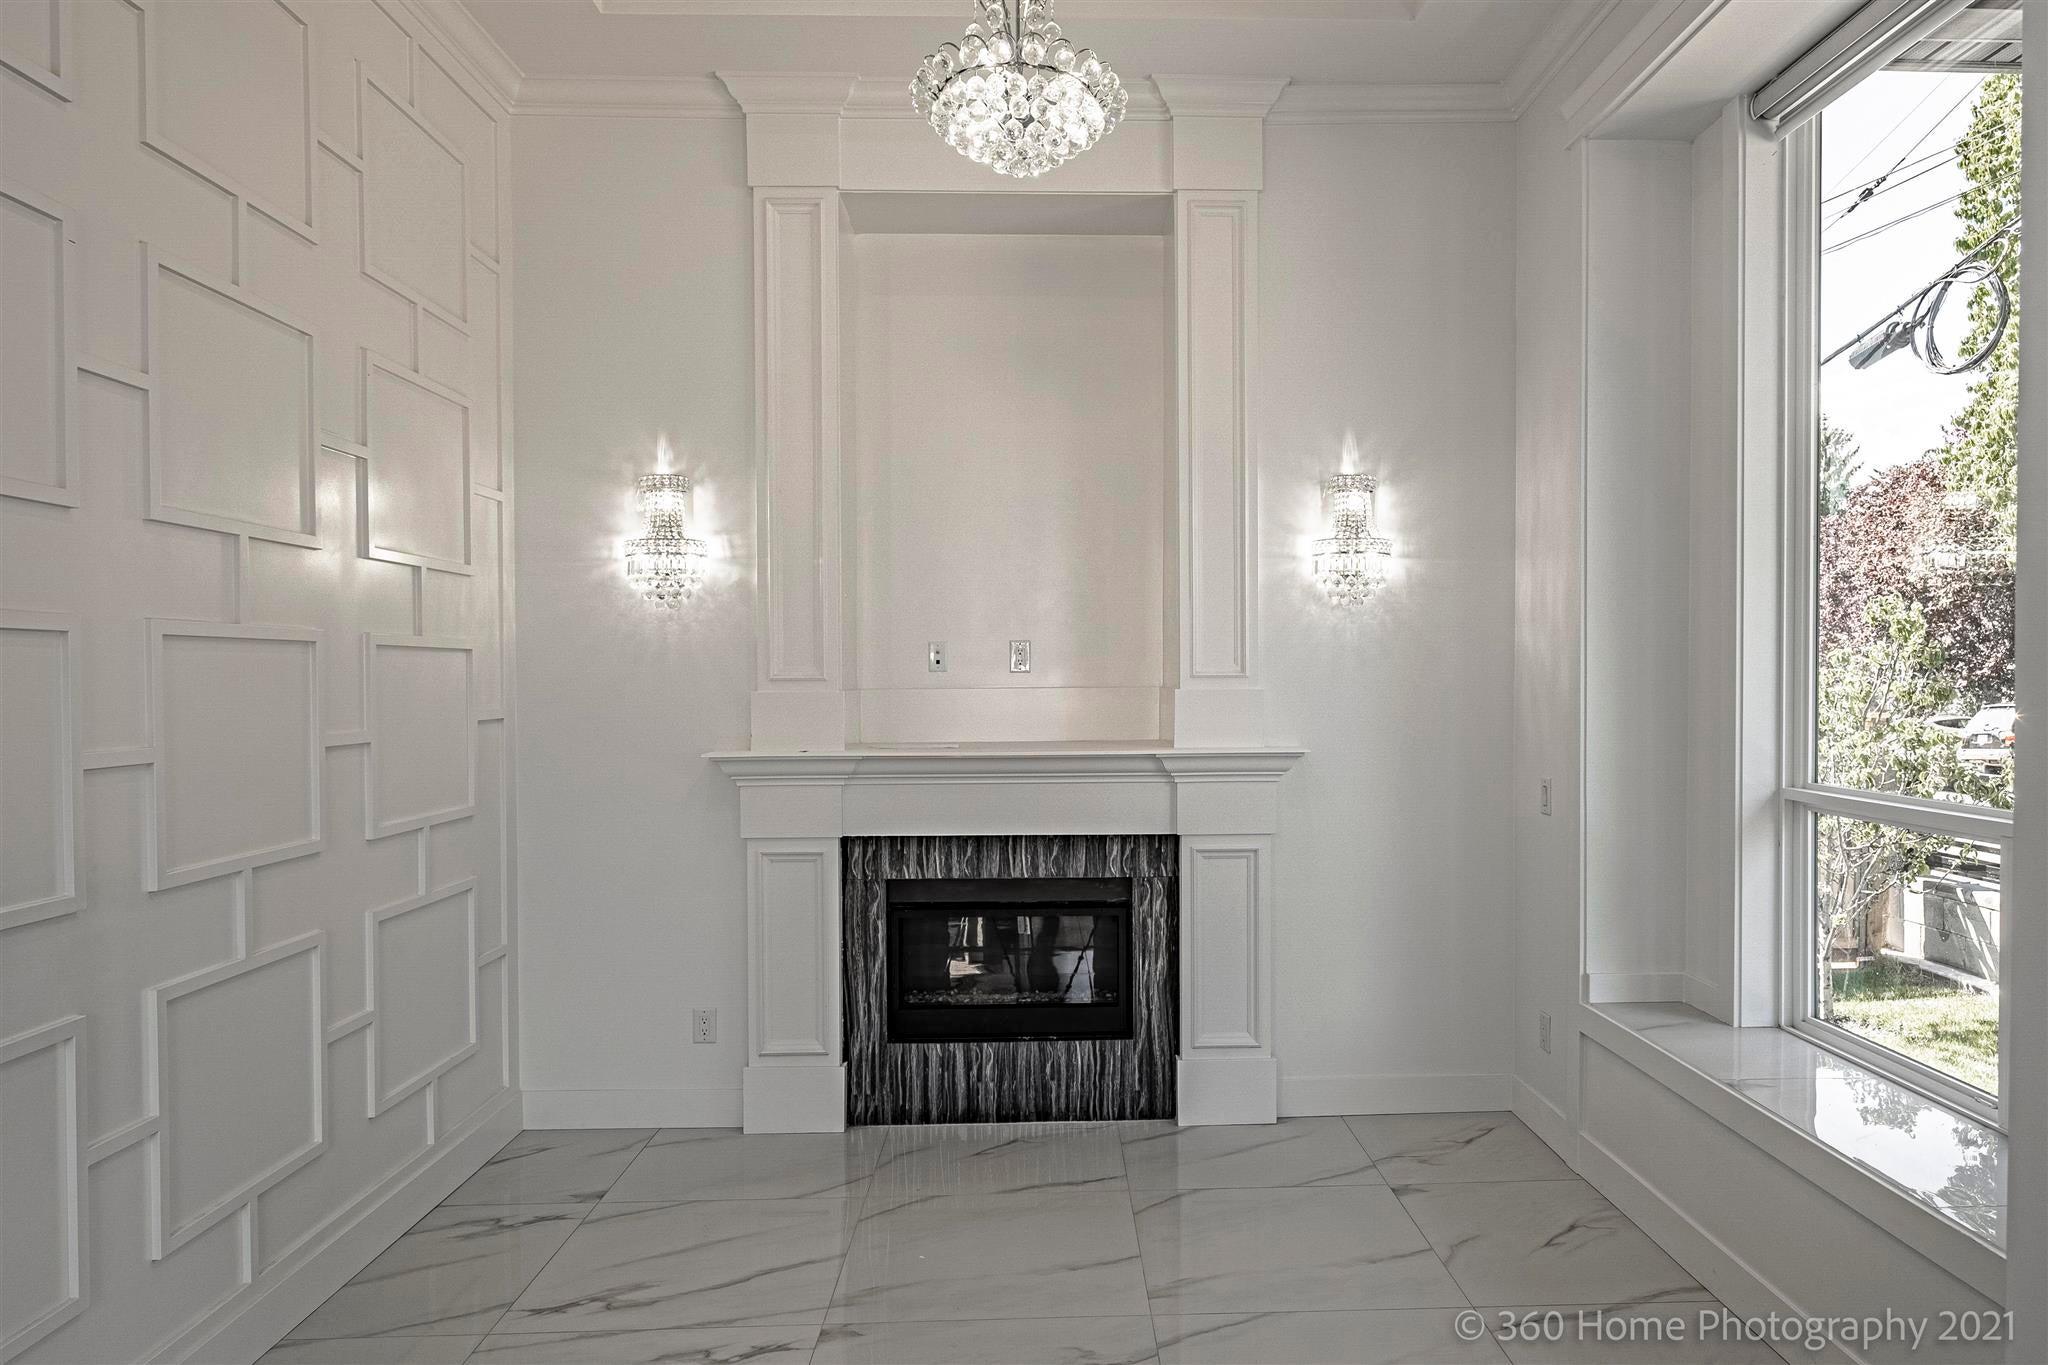 13050 101B AVENUE - Cedar Hills House/Single Family for sale, 5 Bedrooms (R2602208) - #6